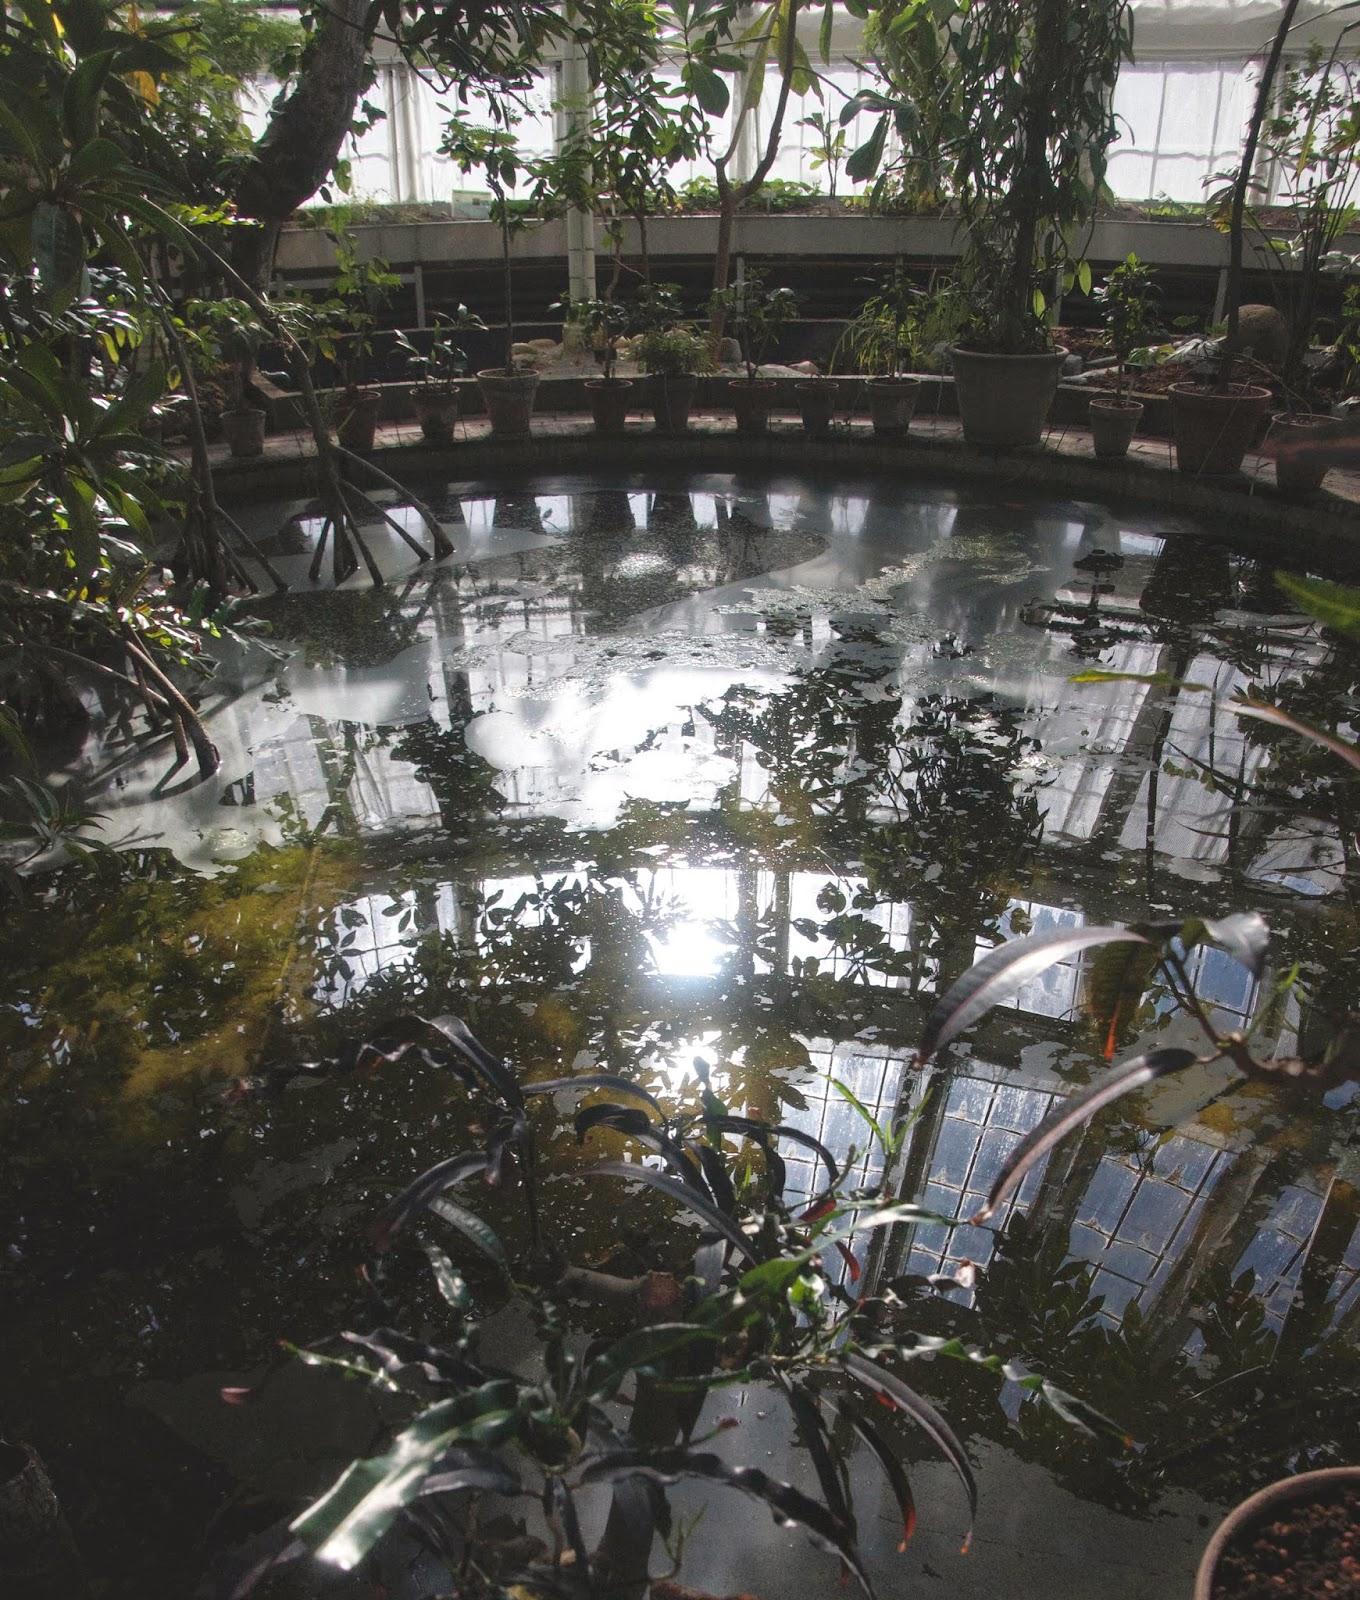 PALMEHUSET - Botanisk Have by Anya Jensen Photography